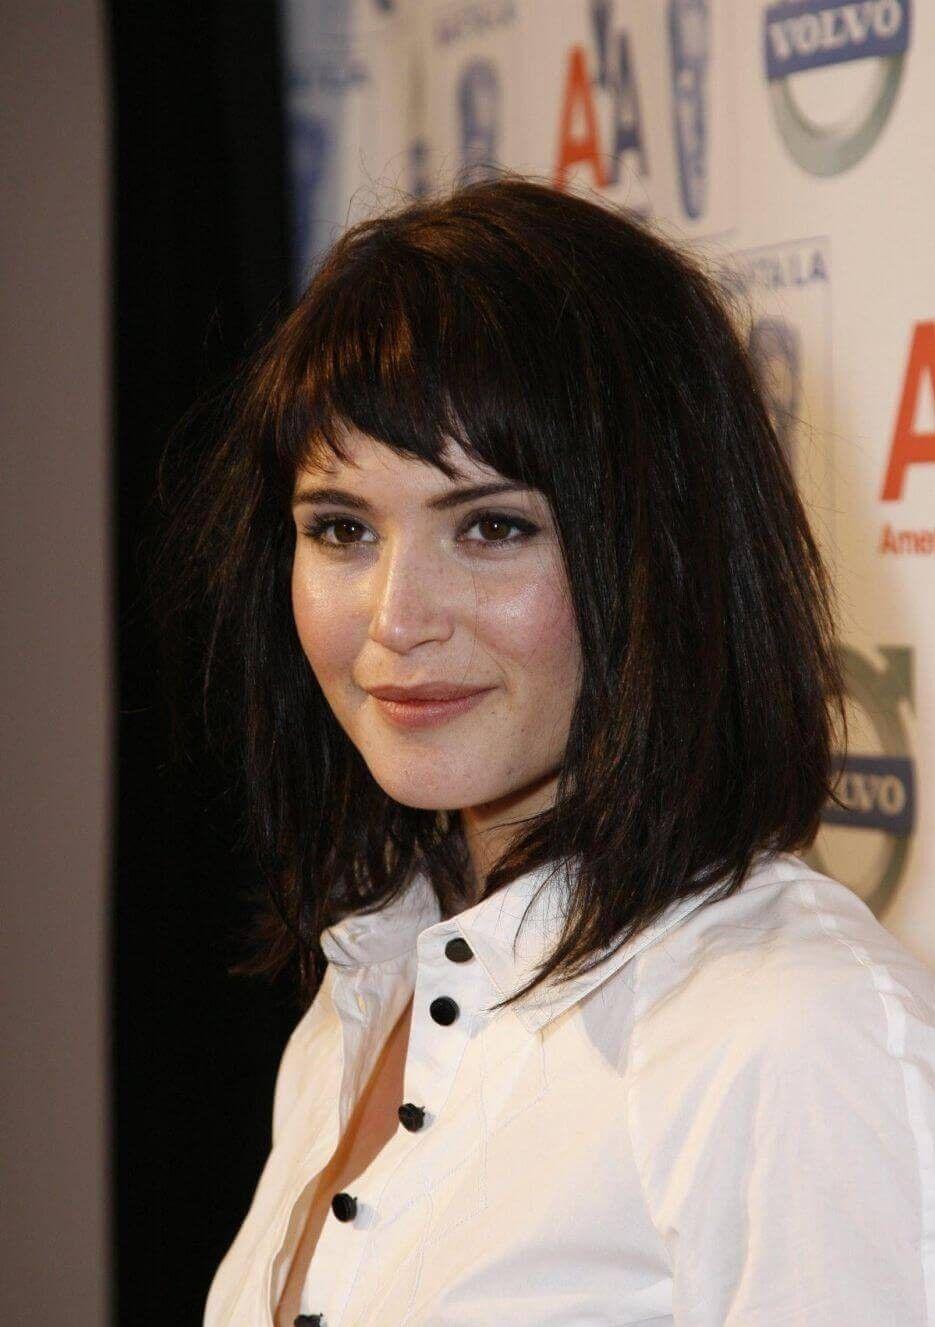 10 Gemma Arterton Hairstyles You Can Copy Fashionterest In 2020 Hair Styles Short Hair Styles Hair Beauty